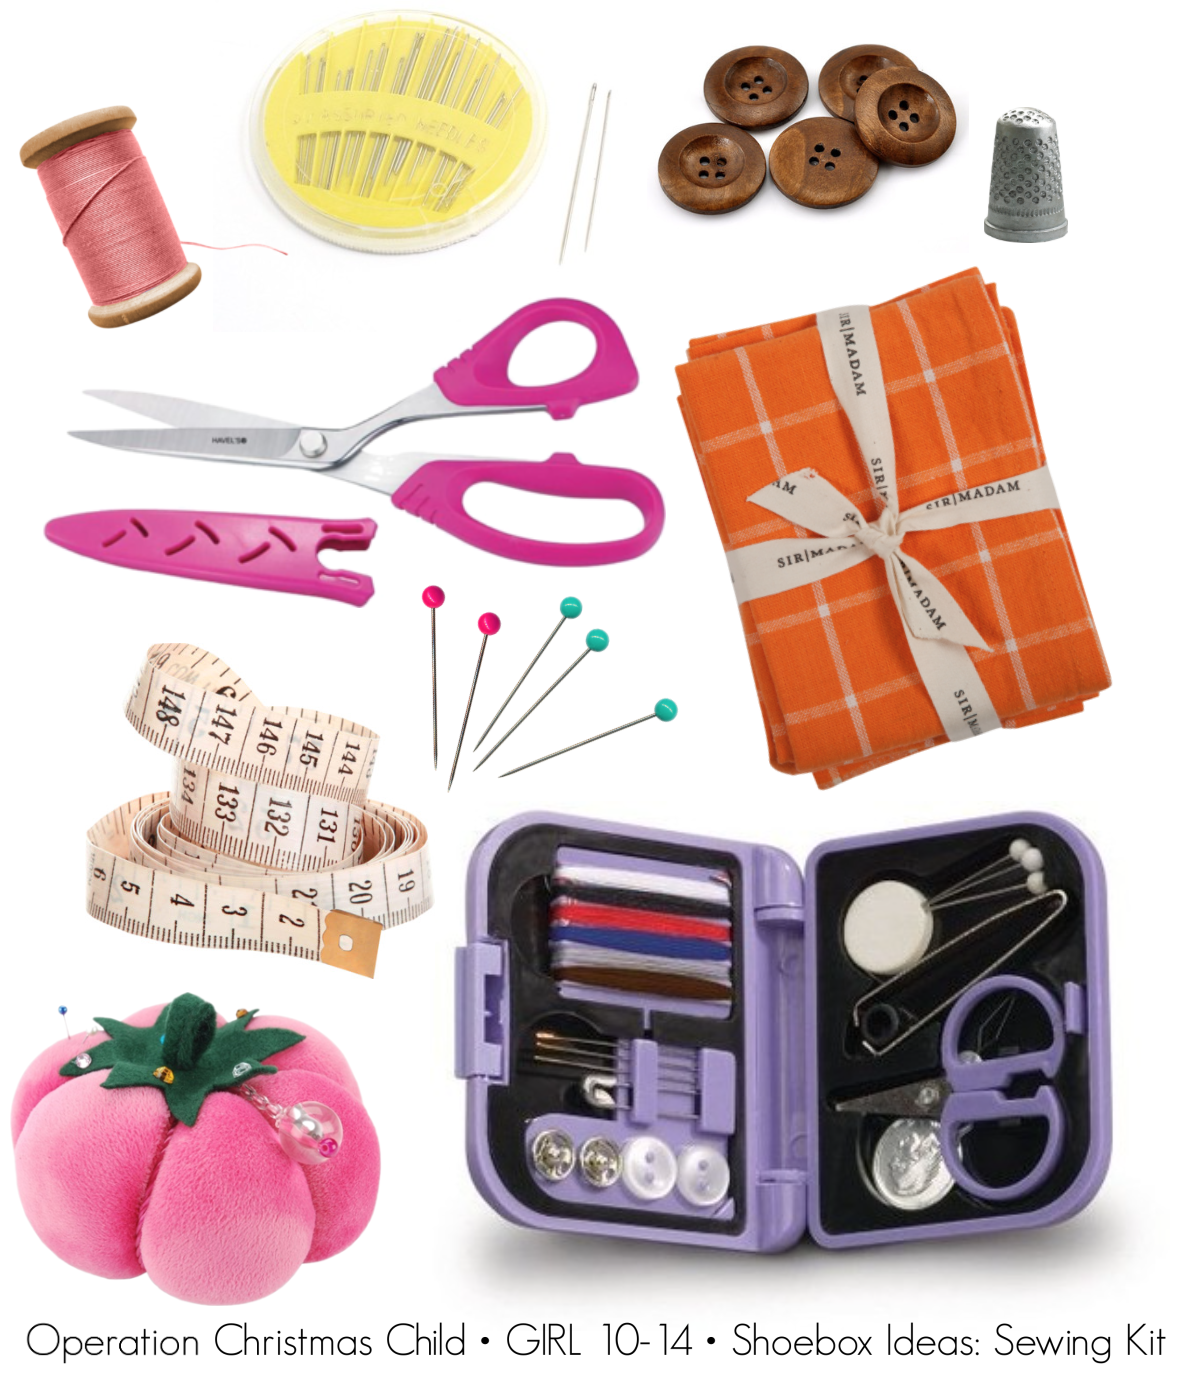 Christmas Gift Ideas For A 14 Year Girl Part - 40: Operation Christmas Child Shoebox Ideas U2022 Girl 10-14